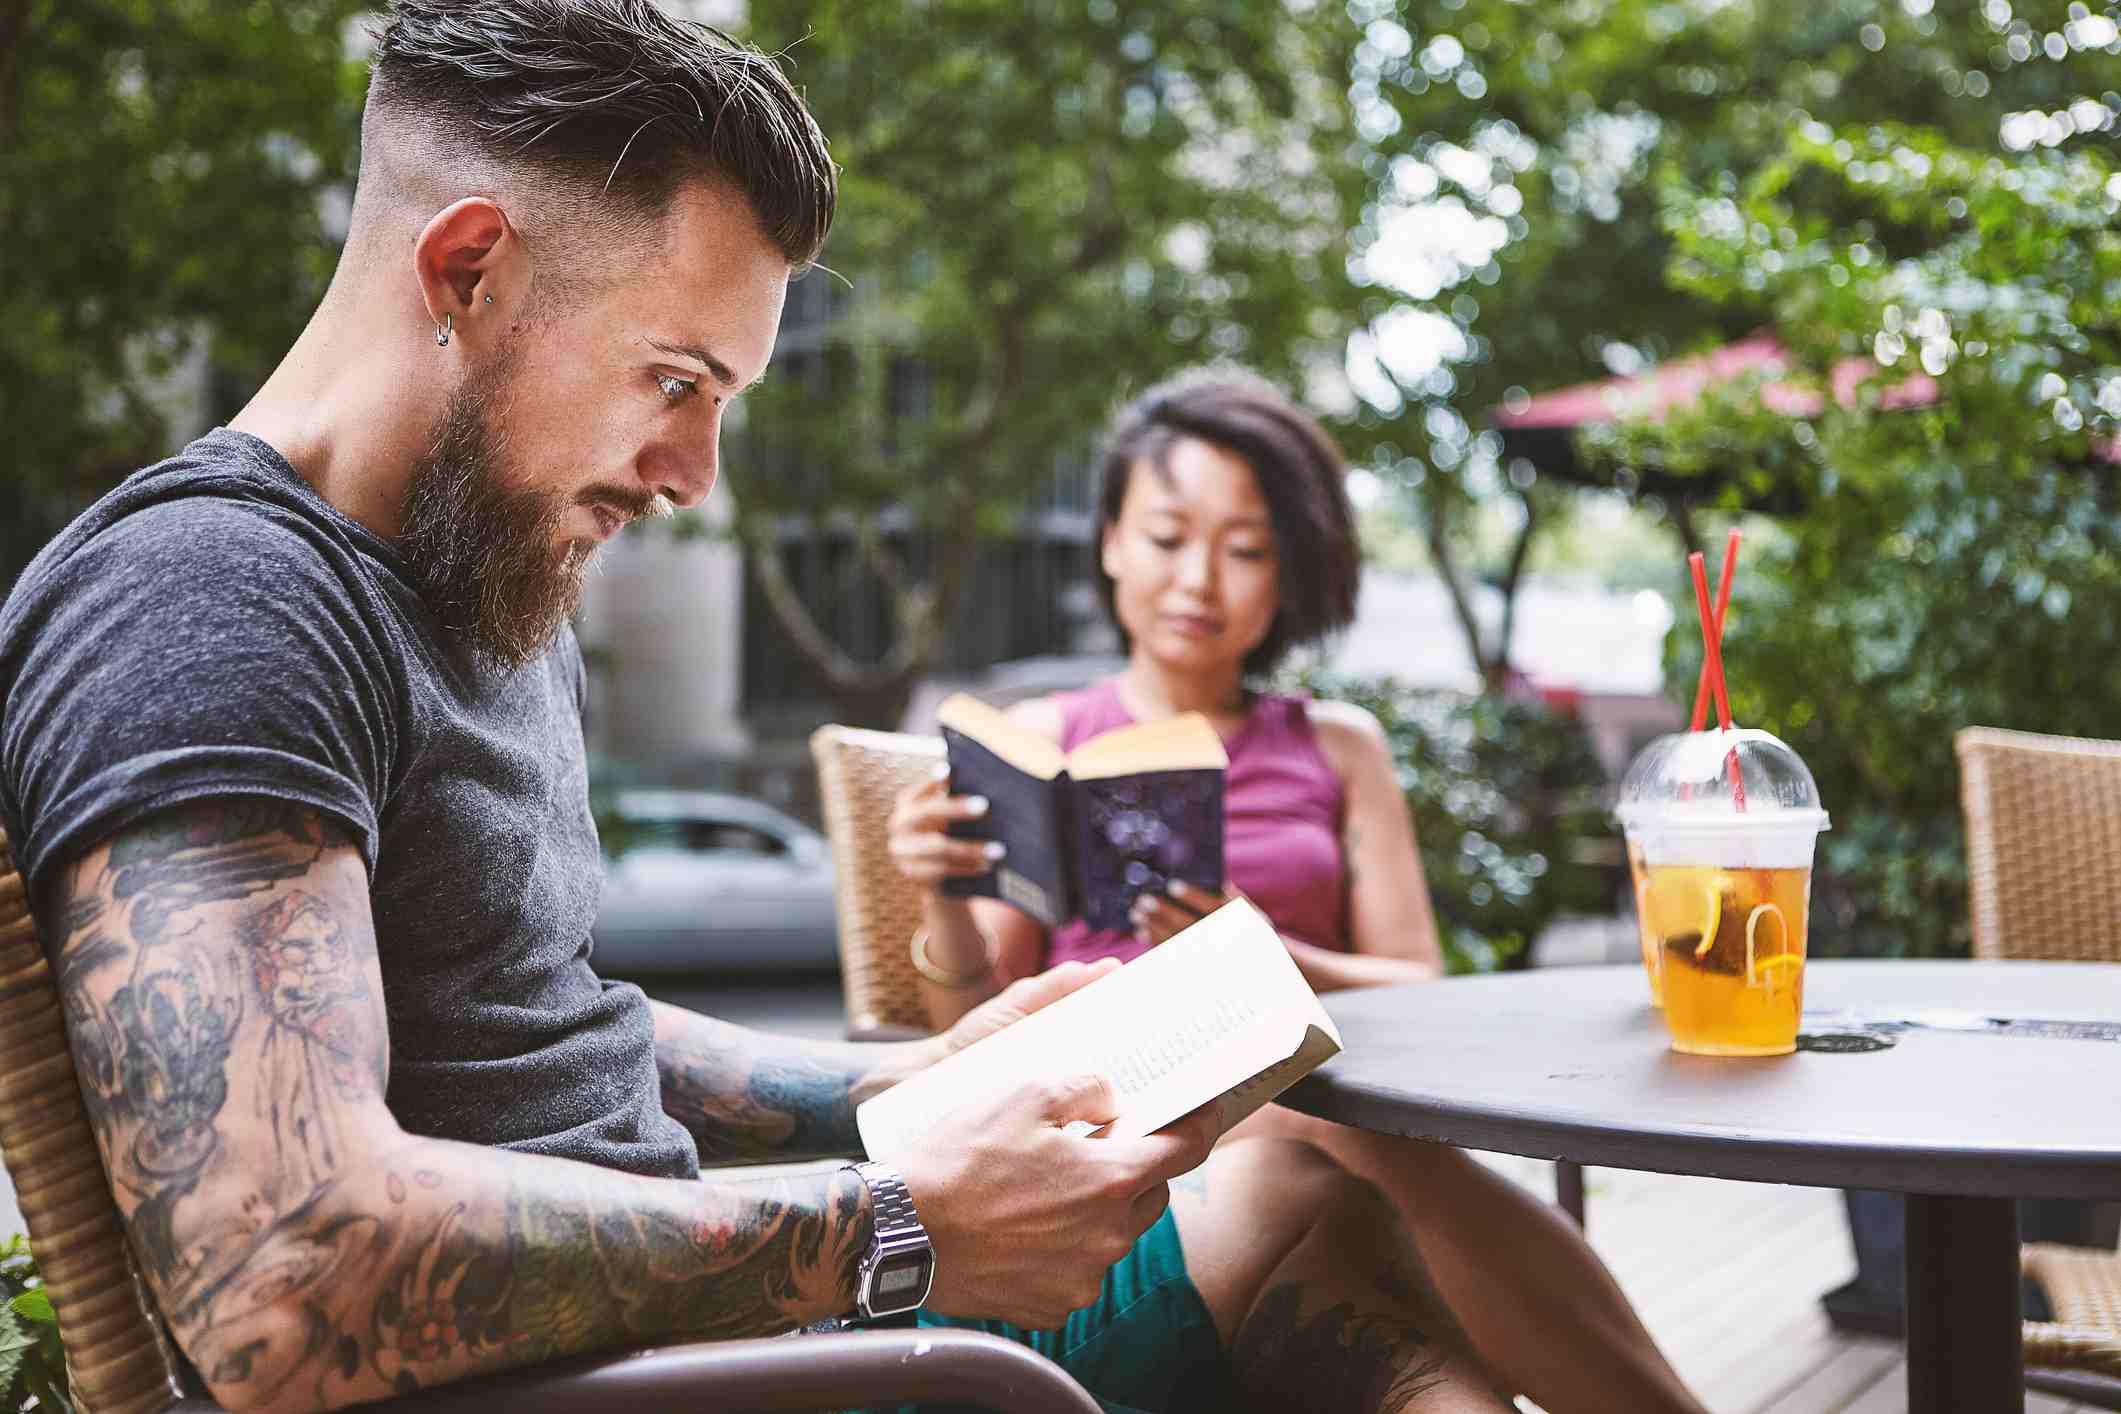 Couple reading books at sidewalk cafe